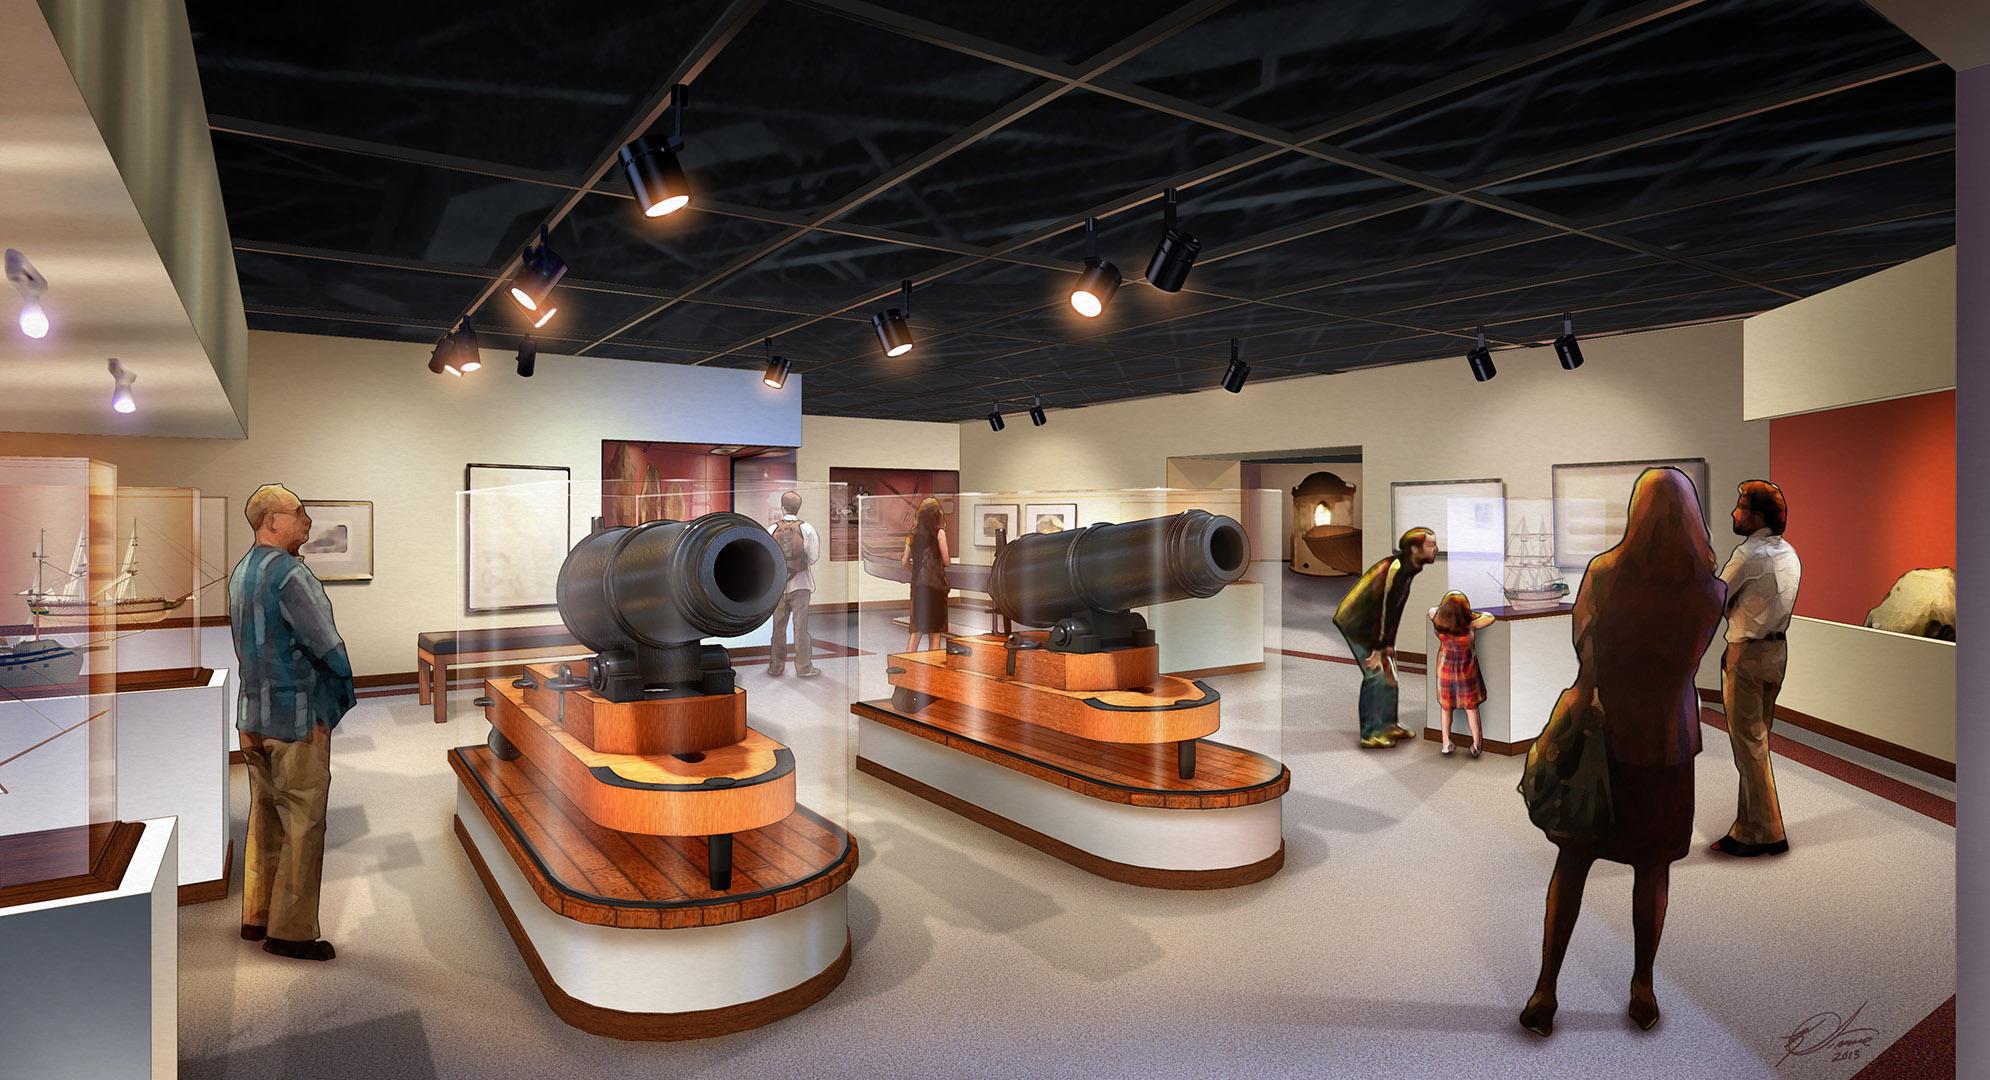 CRMM - Cannon Exhibit